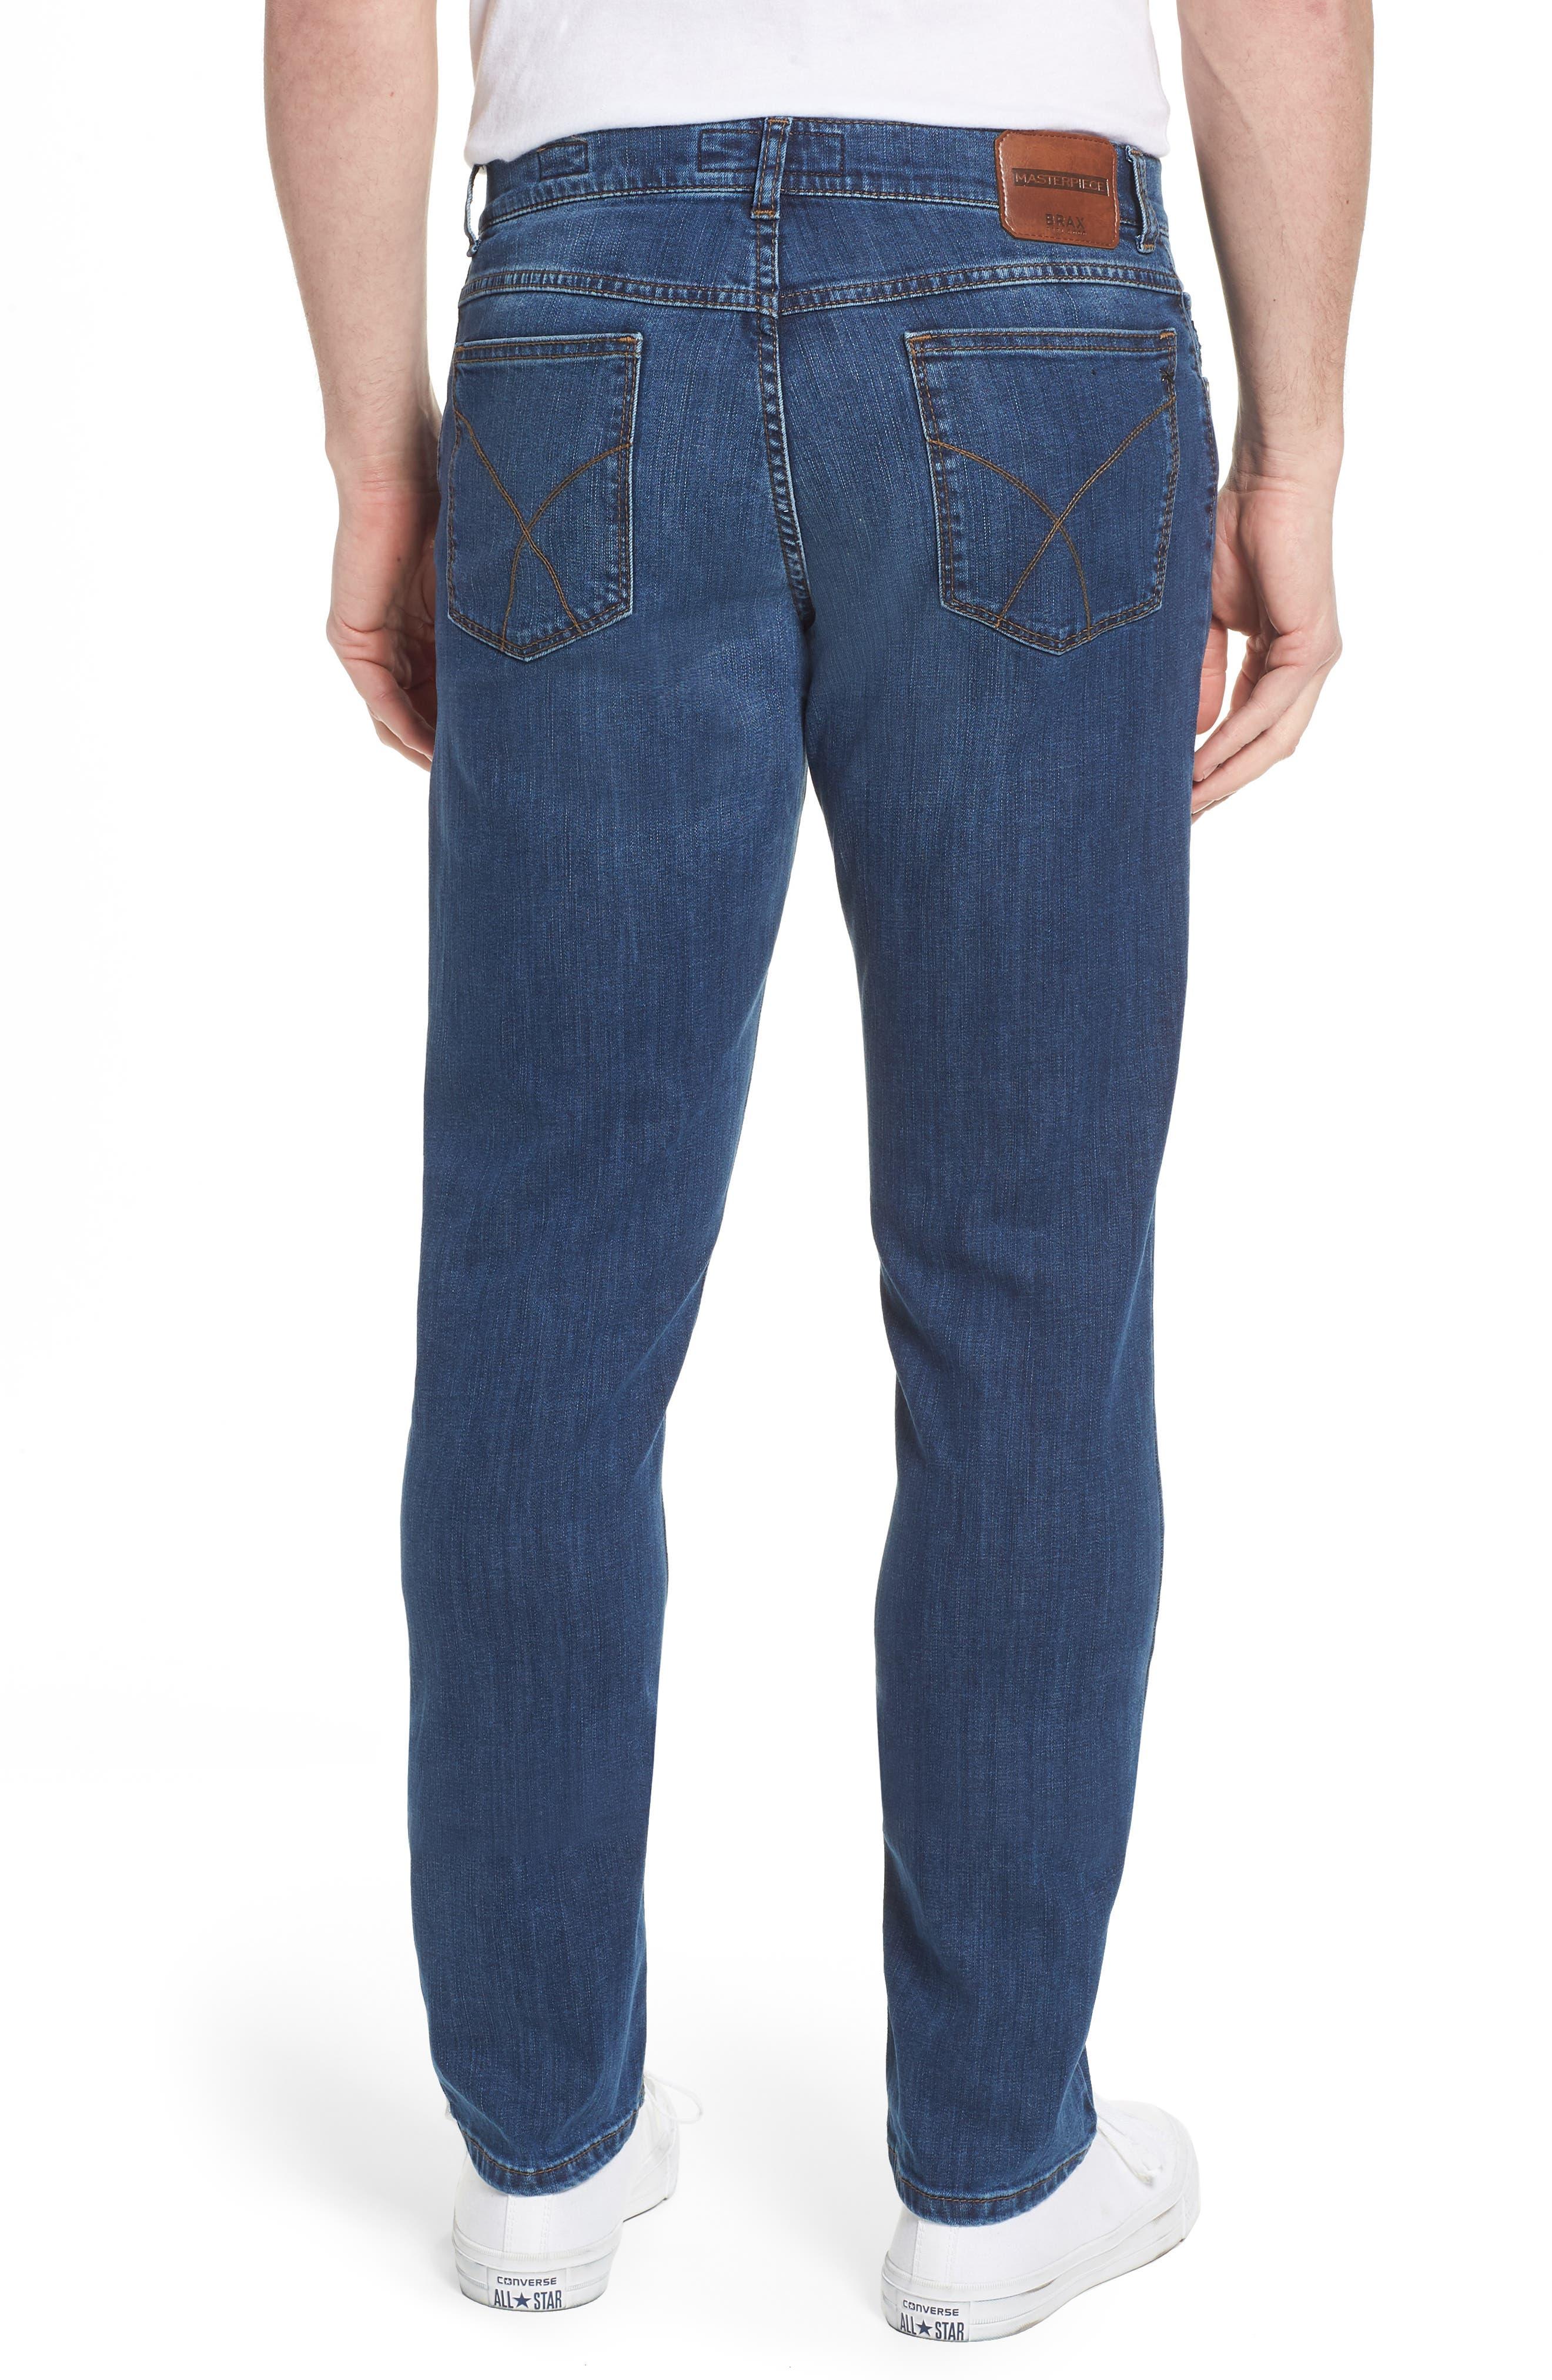 Masterpiece Regular Jeans,                             Alternate thumbnail 6, color,